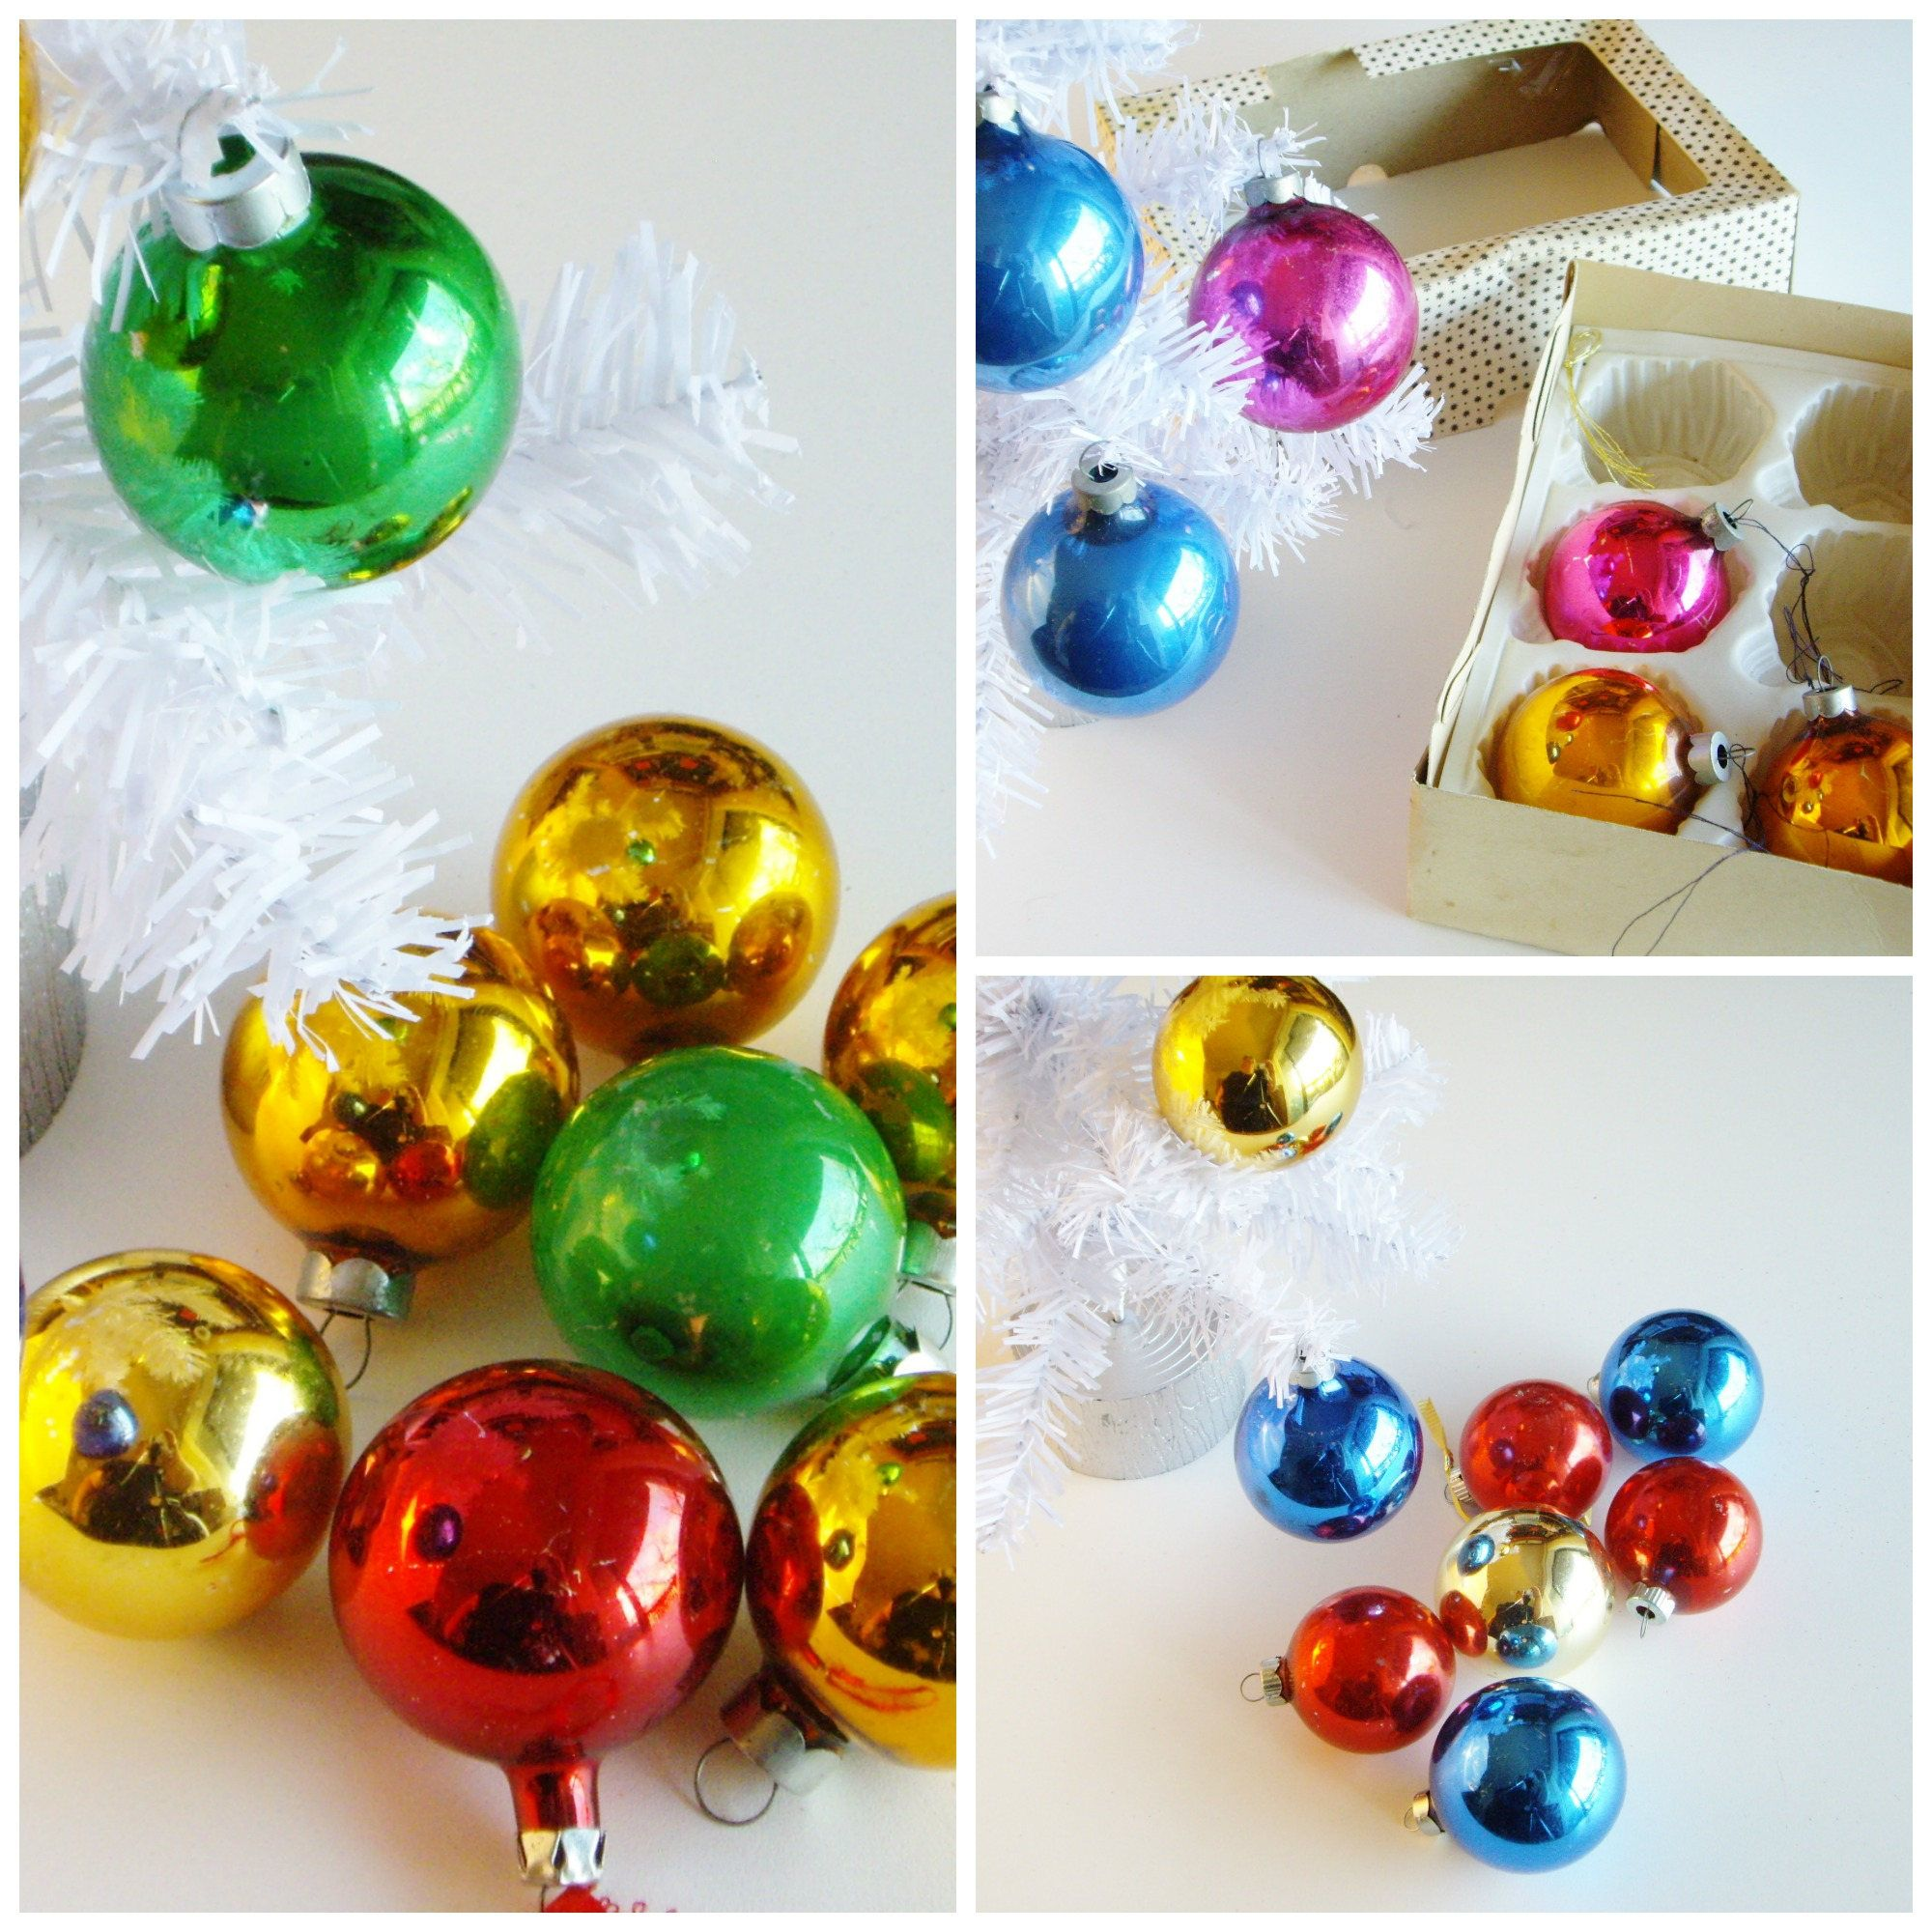 Vintage Glass Christmas Balls Tree Decorations Set Of 24 Lass Ornaments Tree Ornaments Mixed Colors Glass Christmas Balls Shabby Christmas Christmas Balls